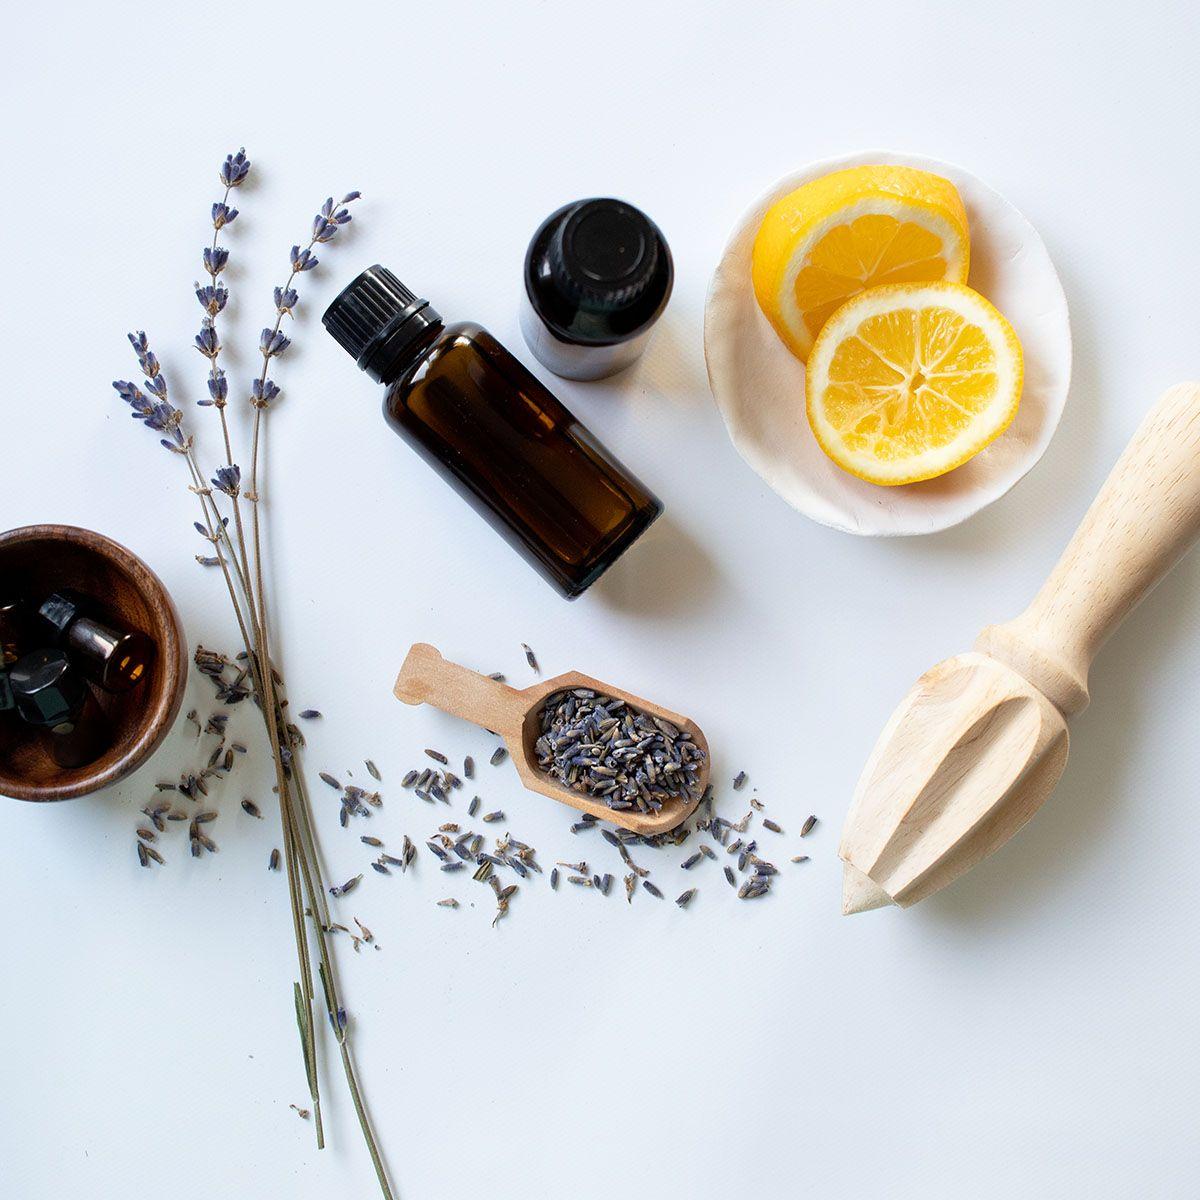 20 essential ingredients for diy natural skincare